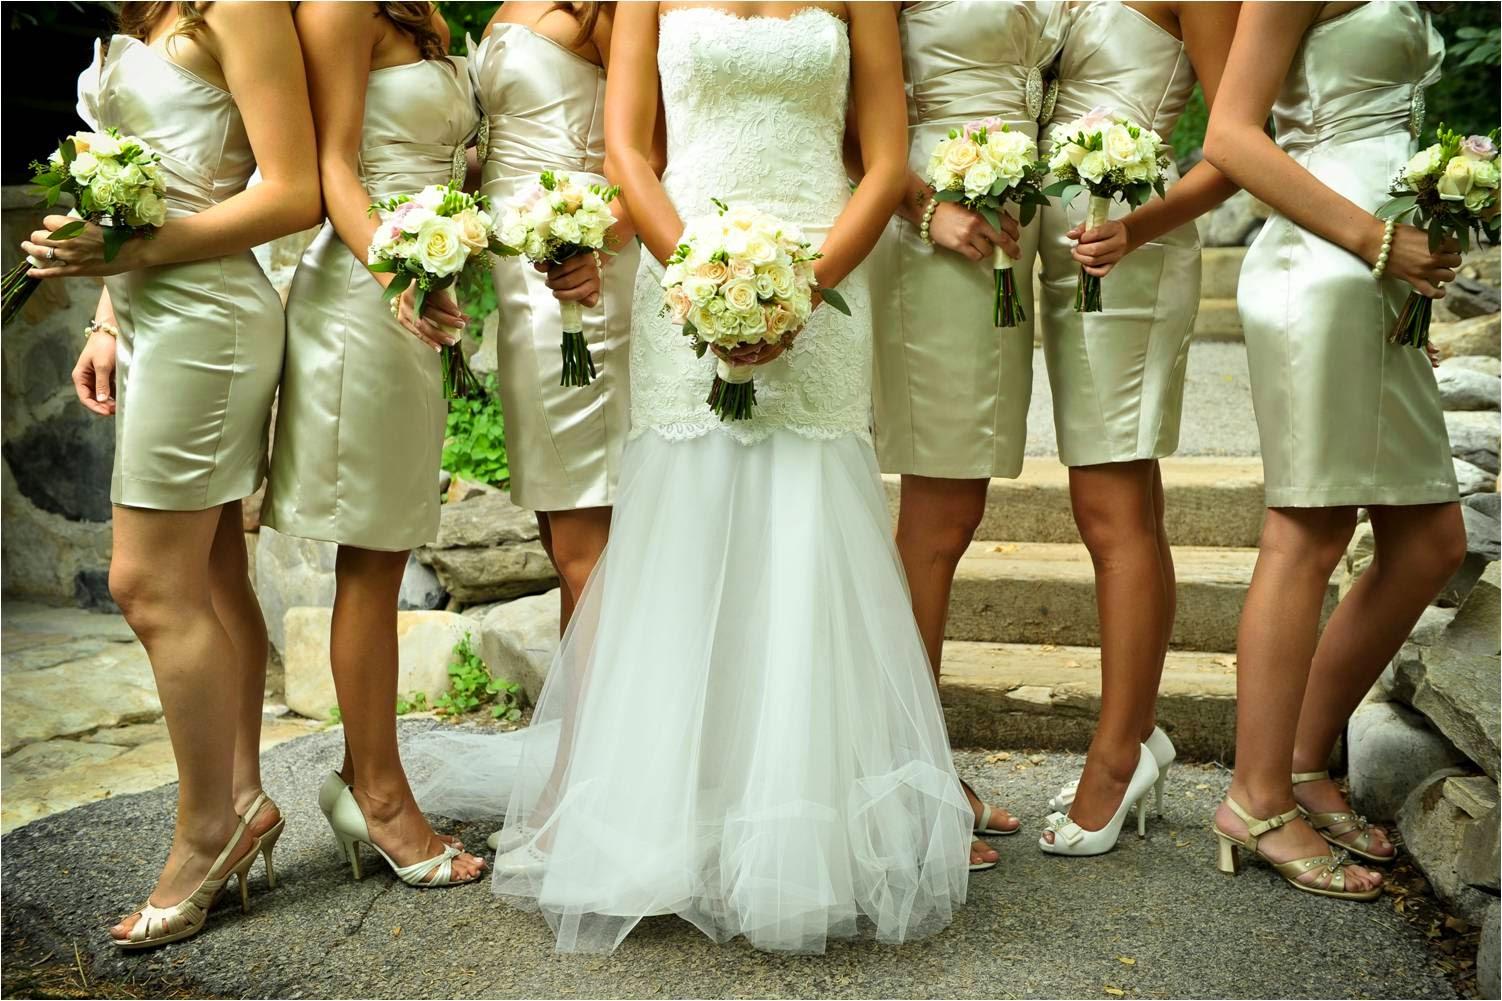 The dress garden utah - The First White Wedding Dress